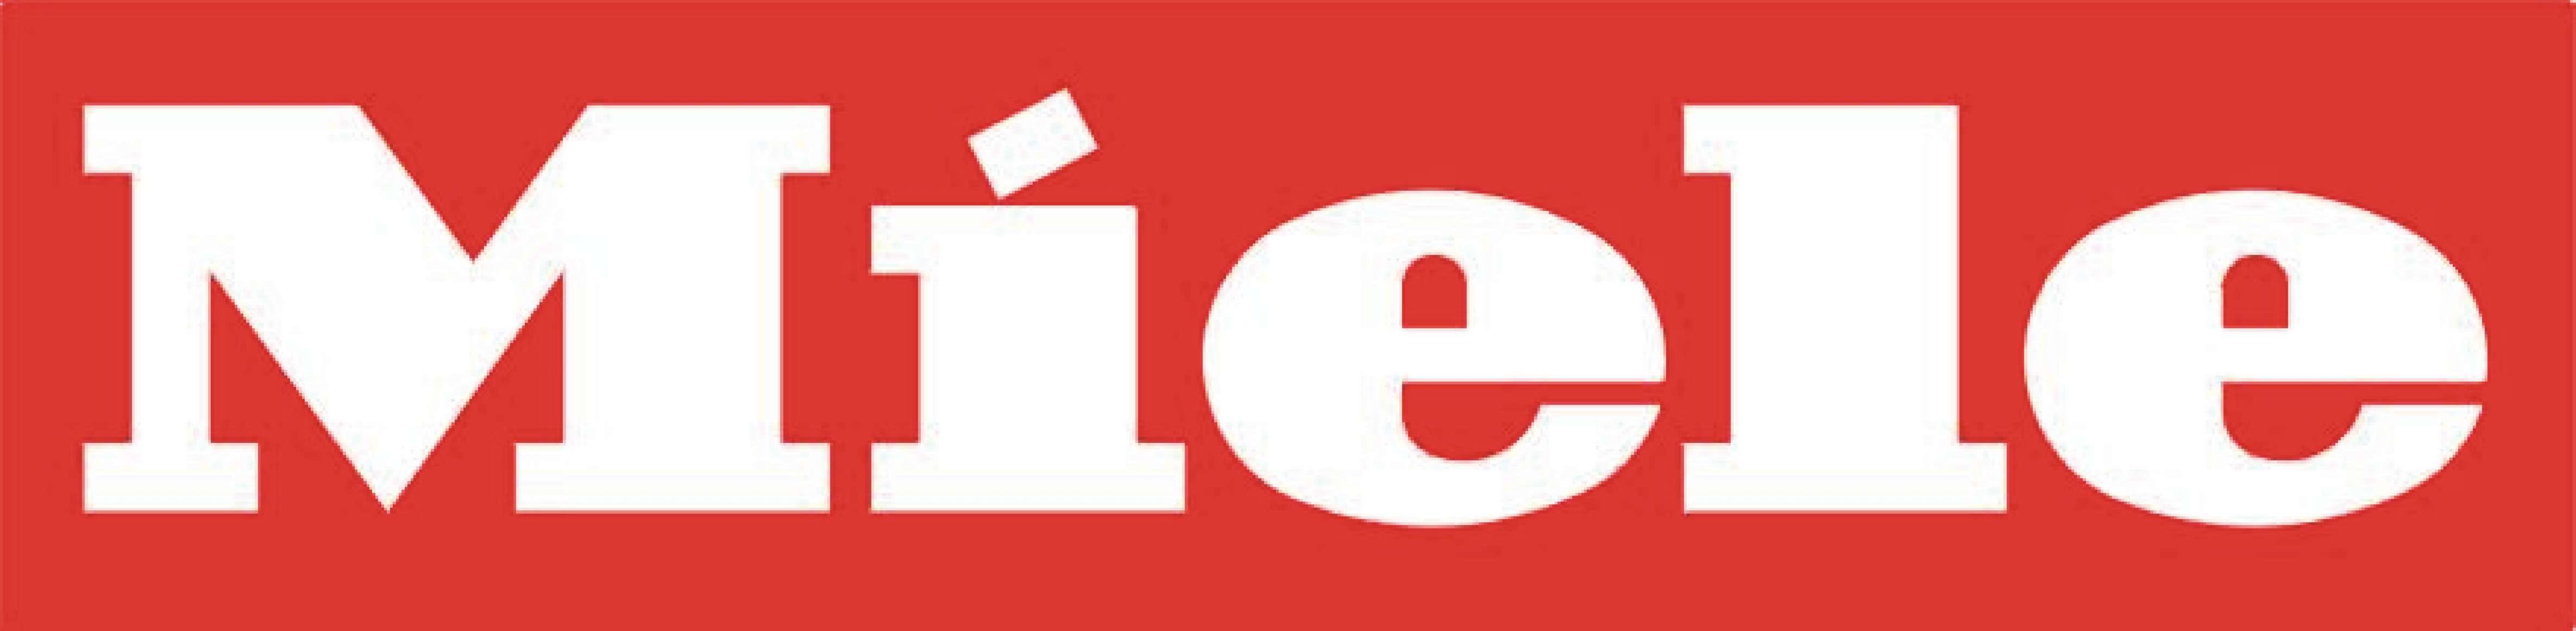 Miele Washing Machine Repairs >> Miele Logos